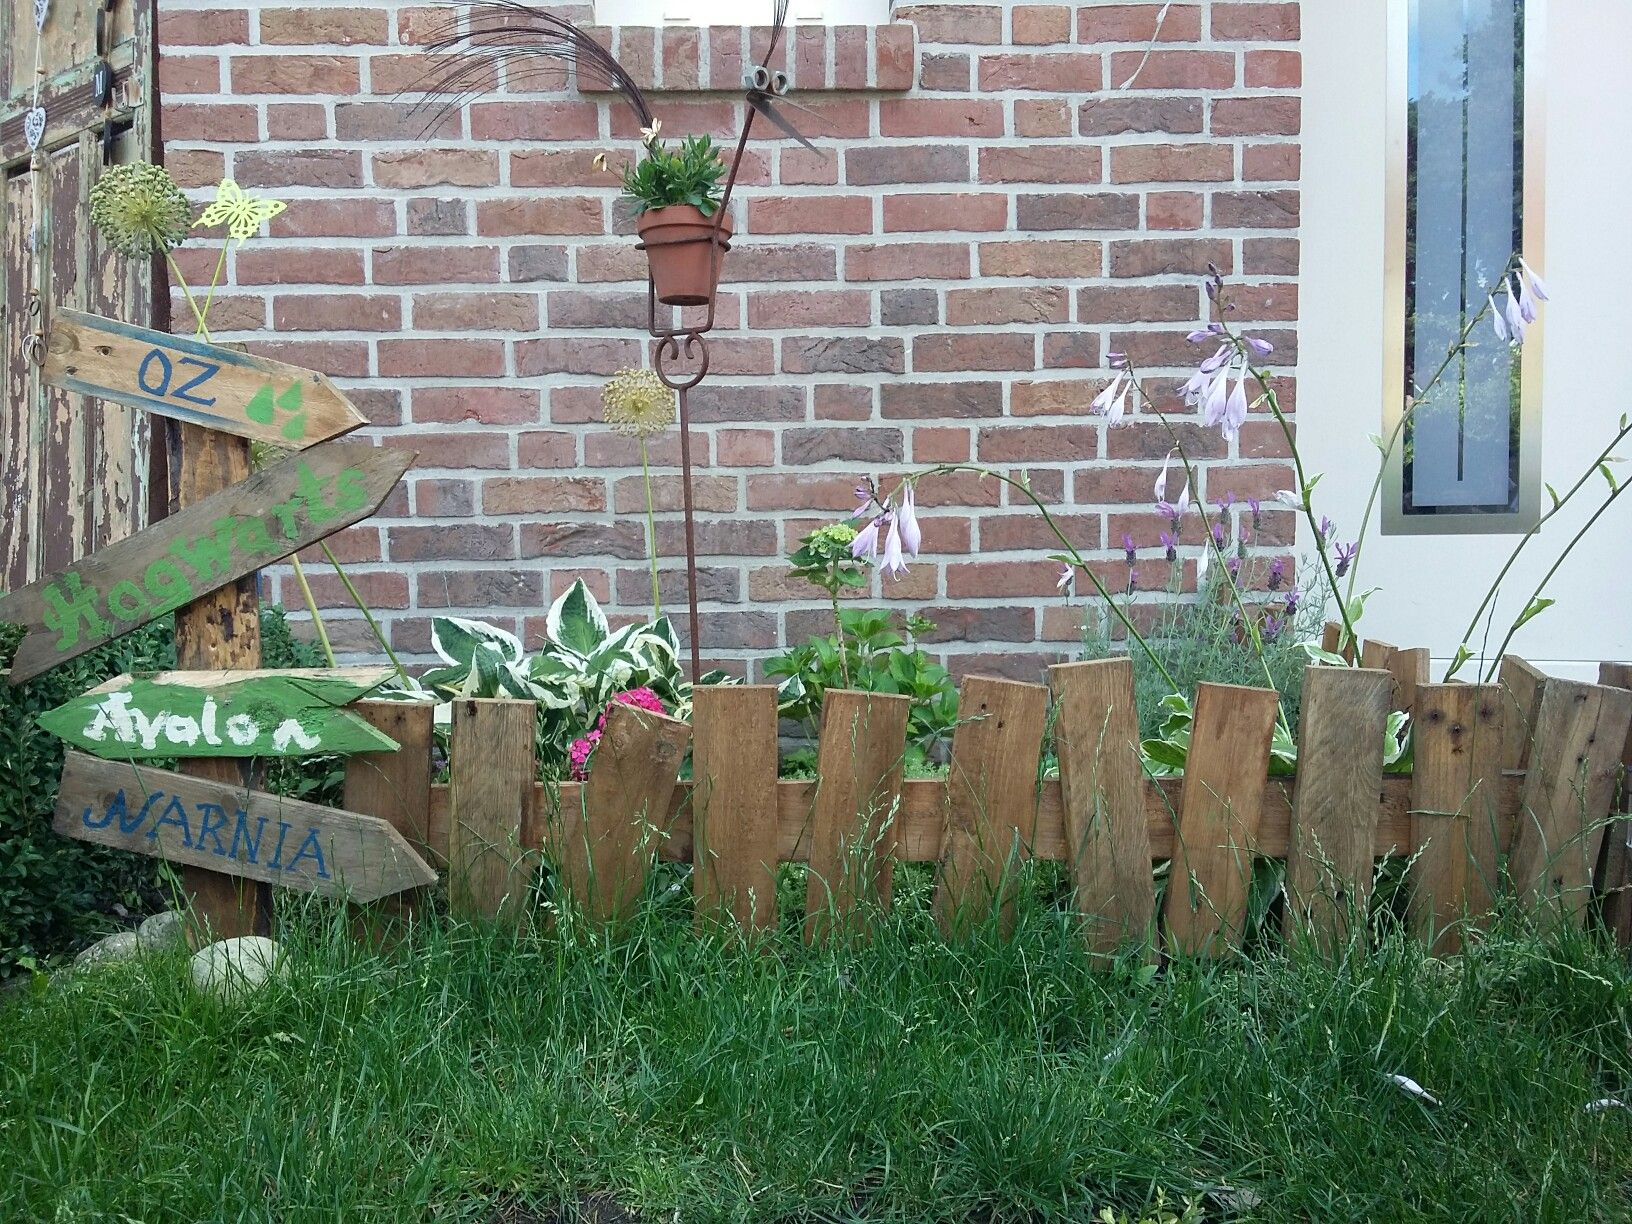 Beetbegrenzung gartenzaun aus paletten holz gartenzaun - Gartenzaun aus paletten ...